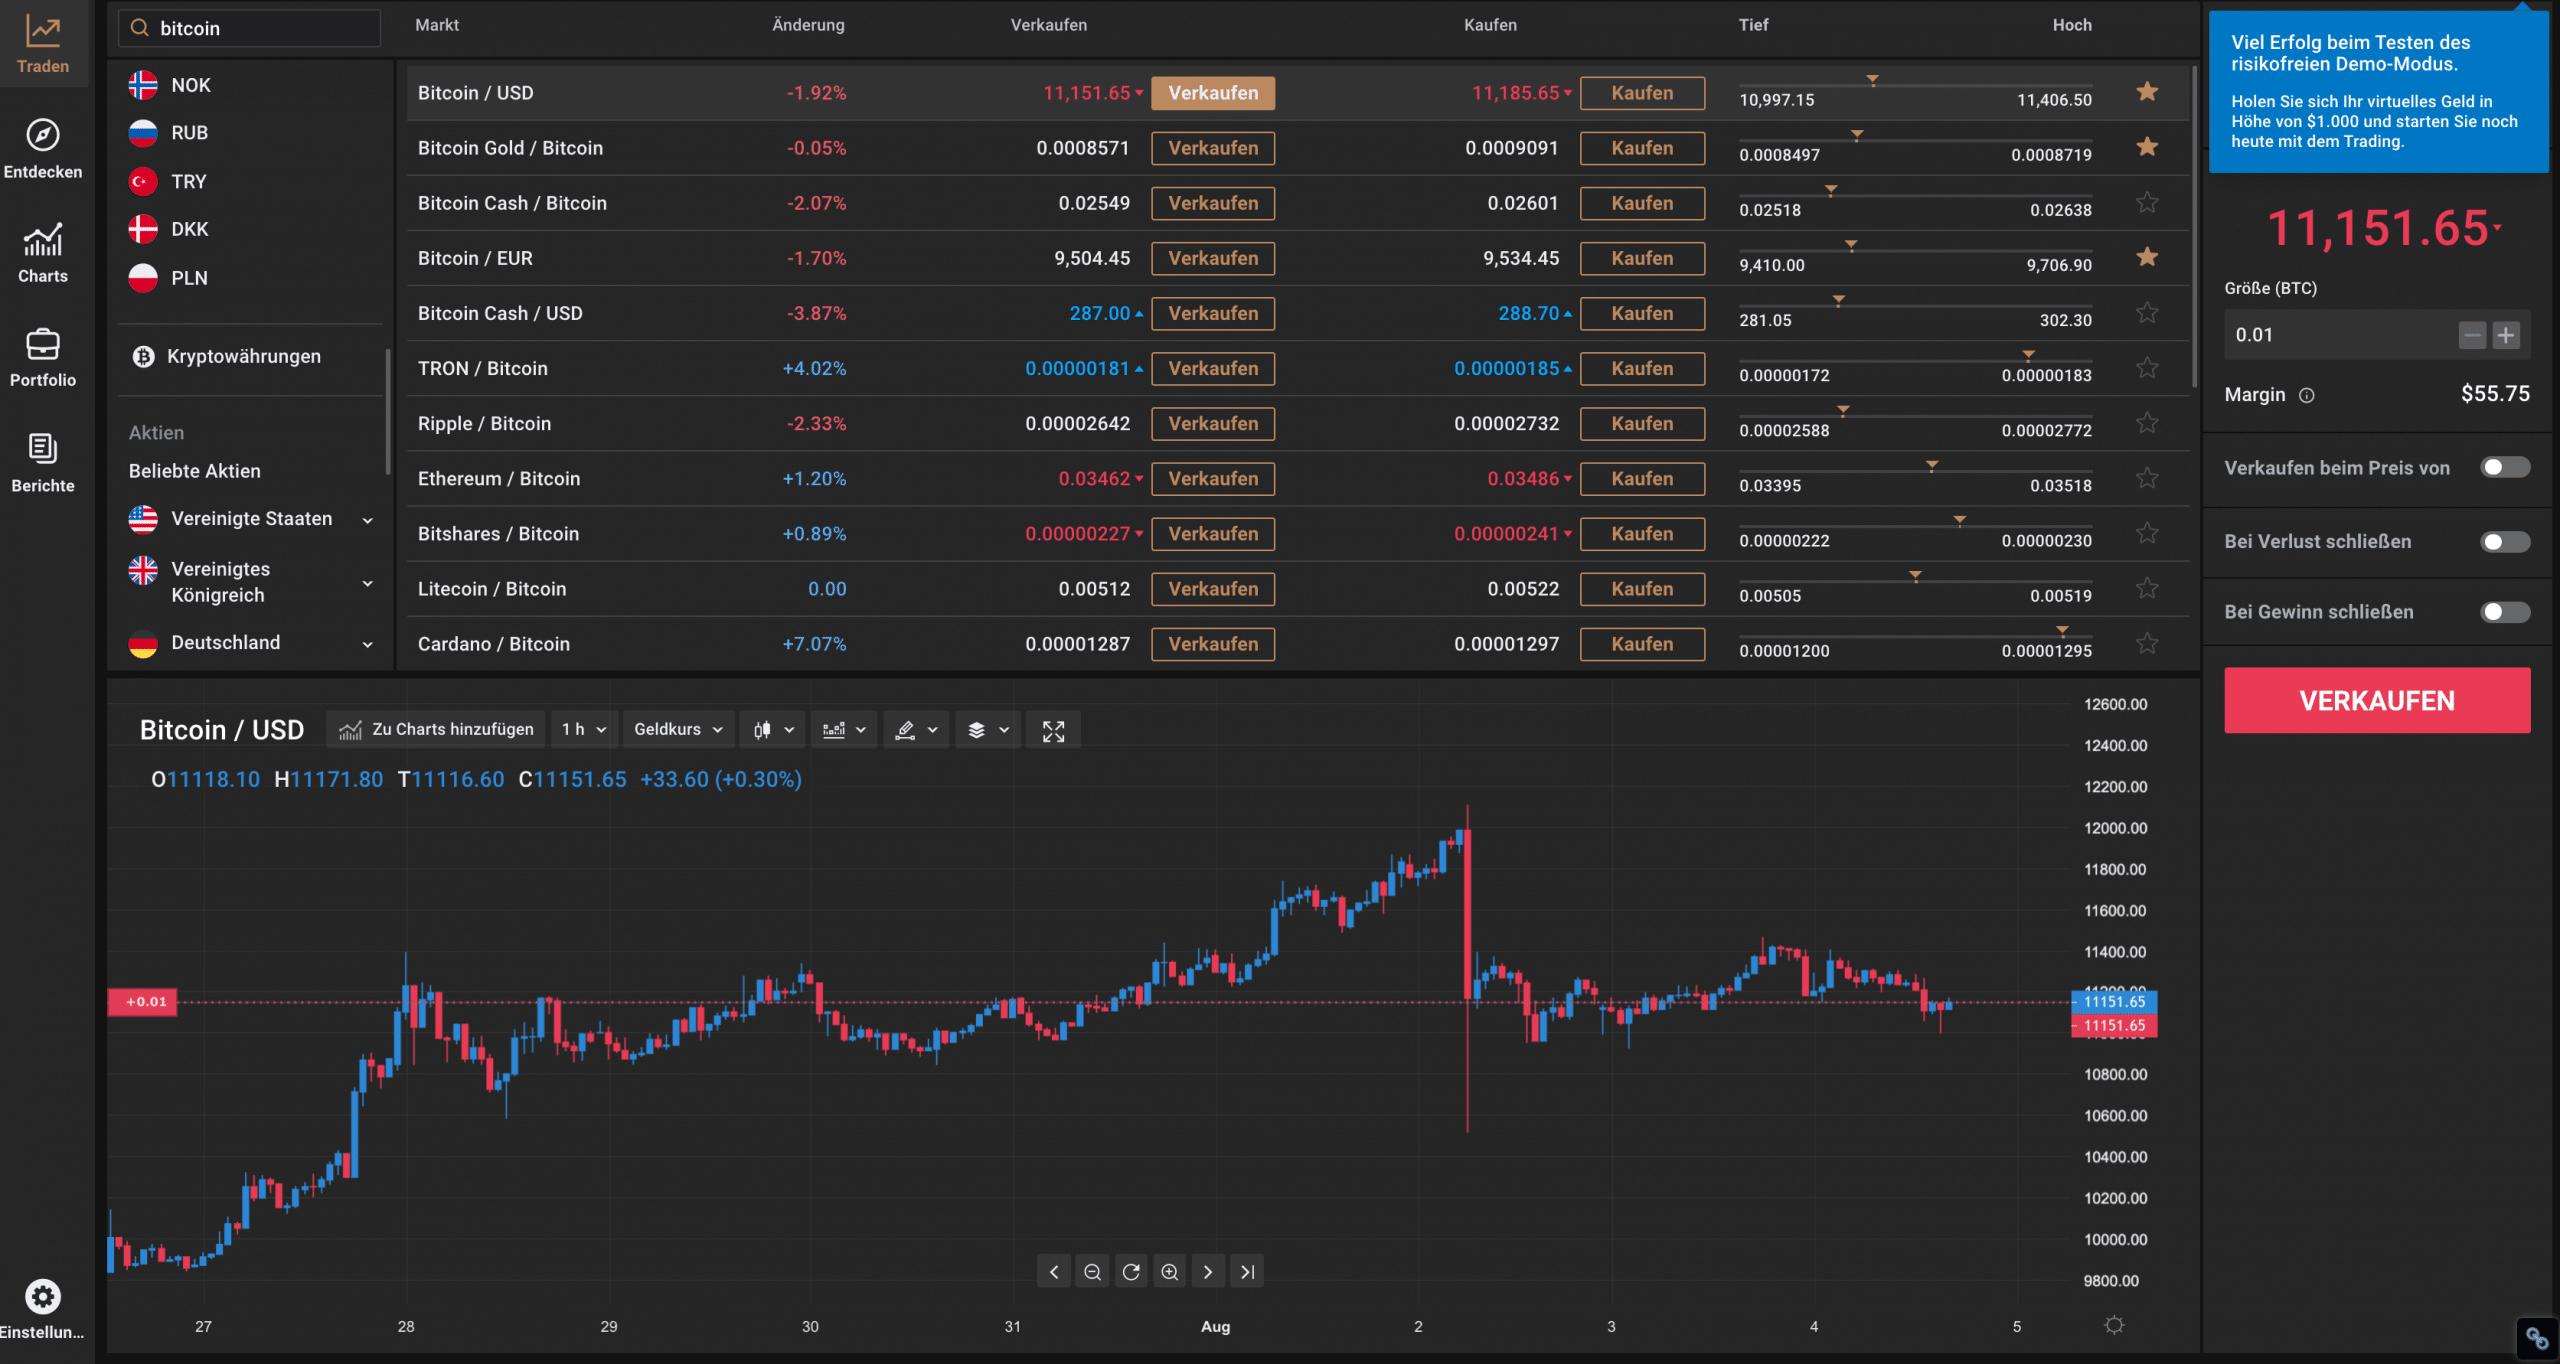 Bitcoin Verkaufen